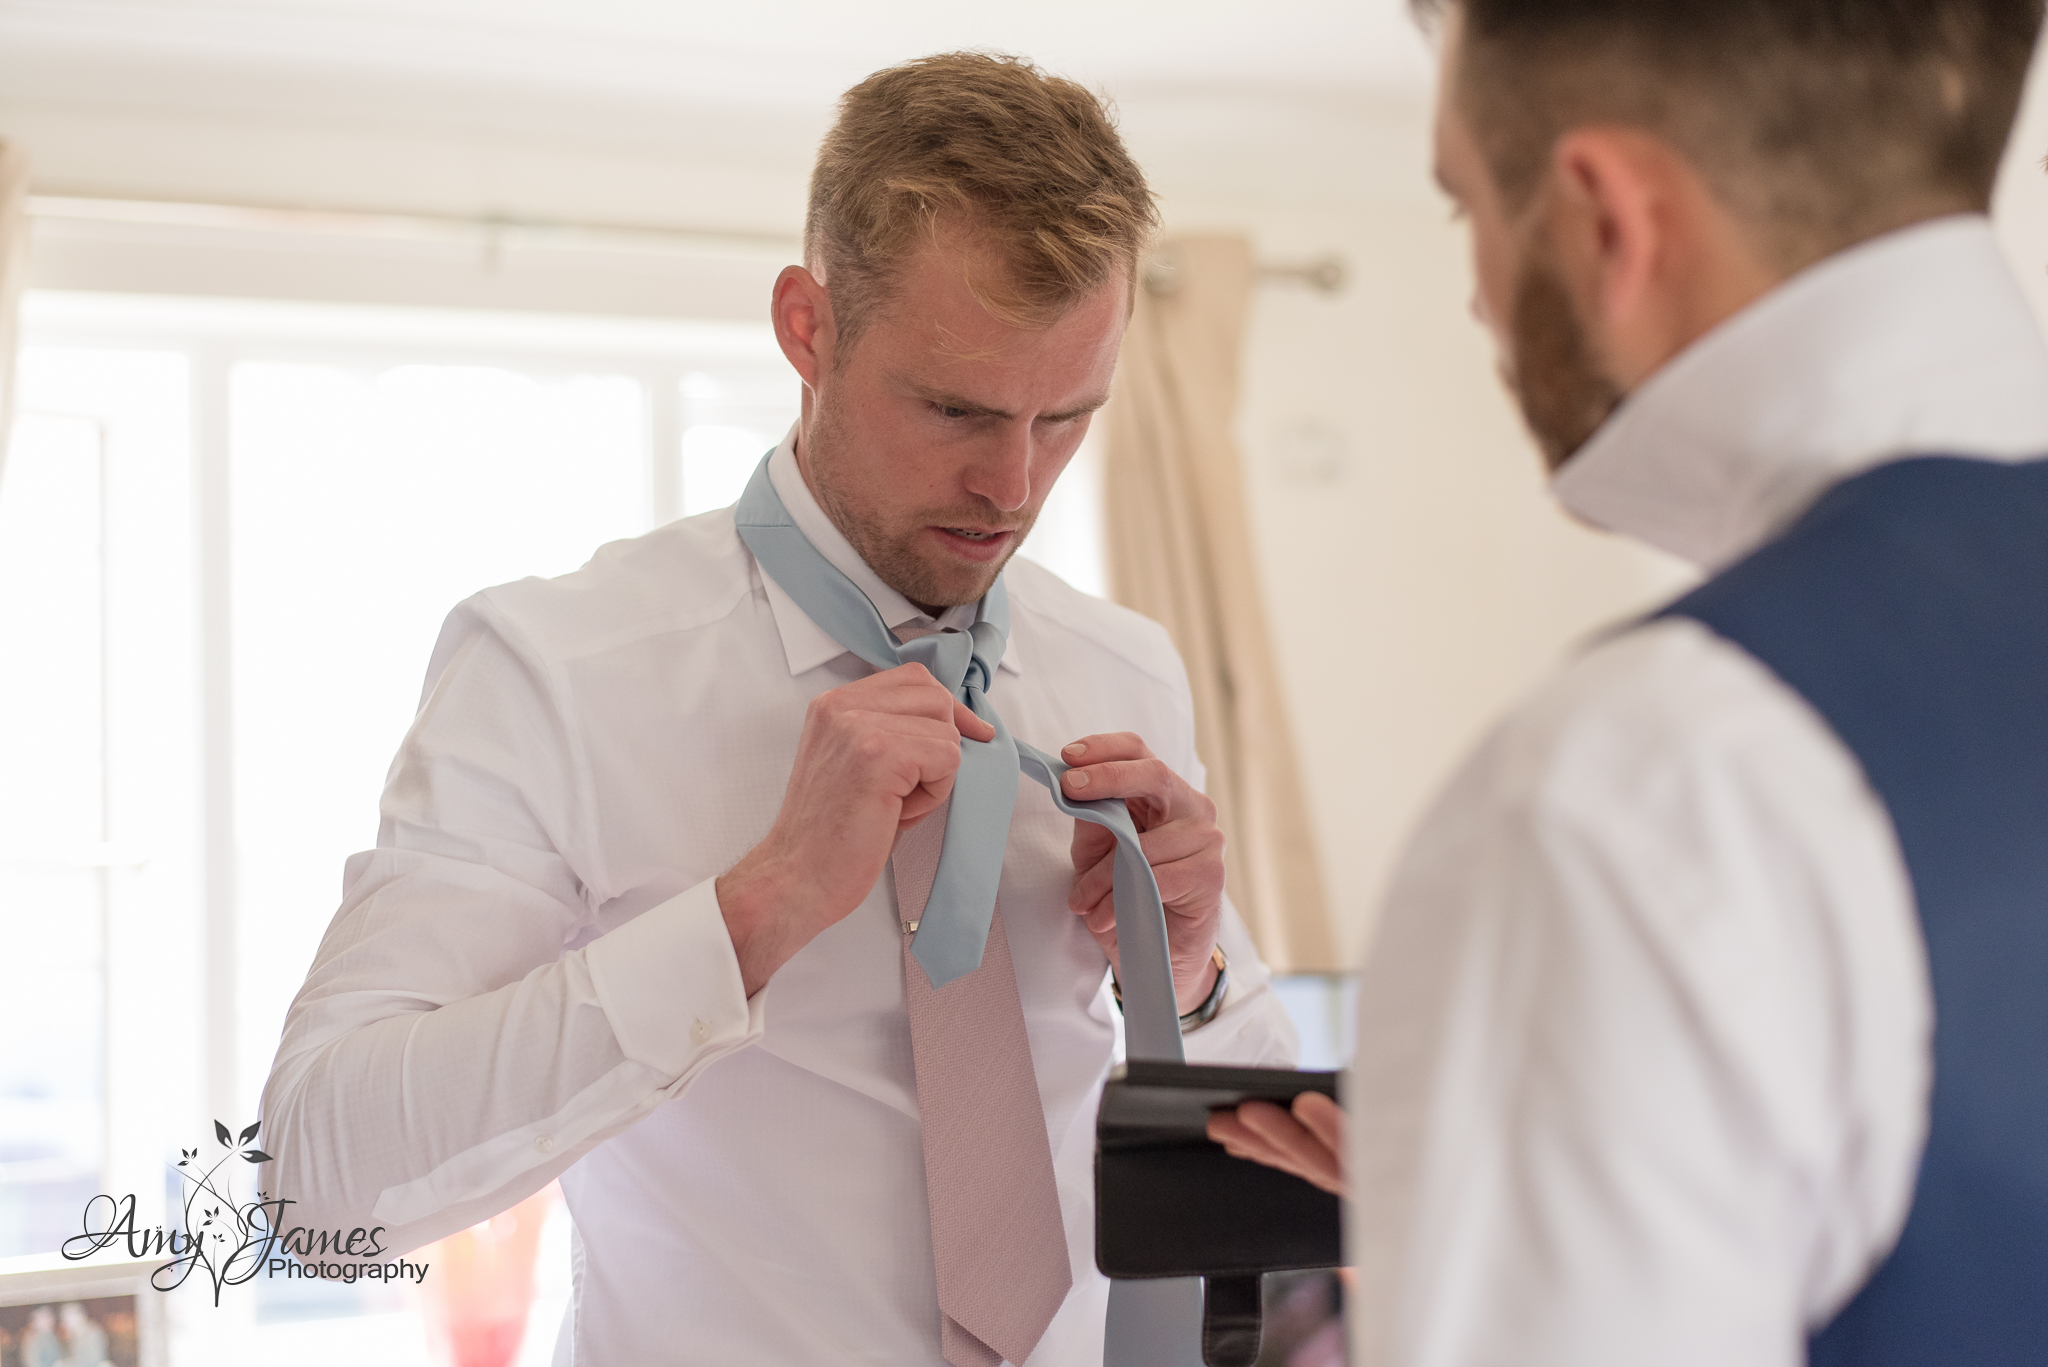 Warbrook House wedding / Fleet wedding photographer // Hampshire wedding photographer / Aldershot Garrison wedding